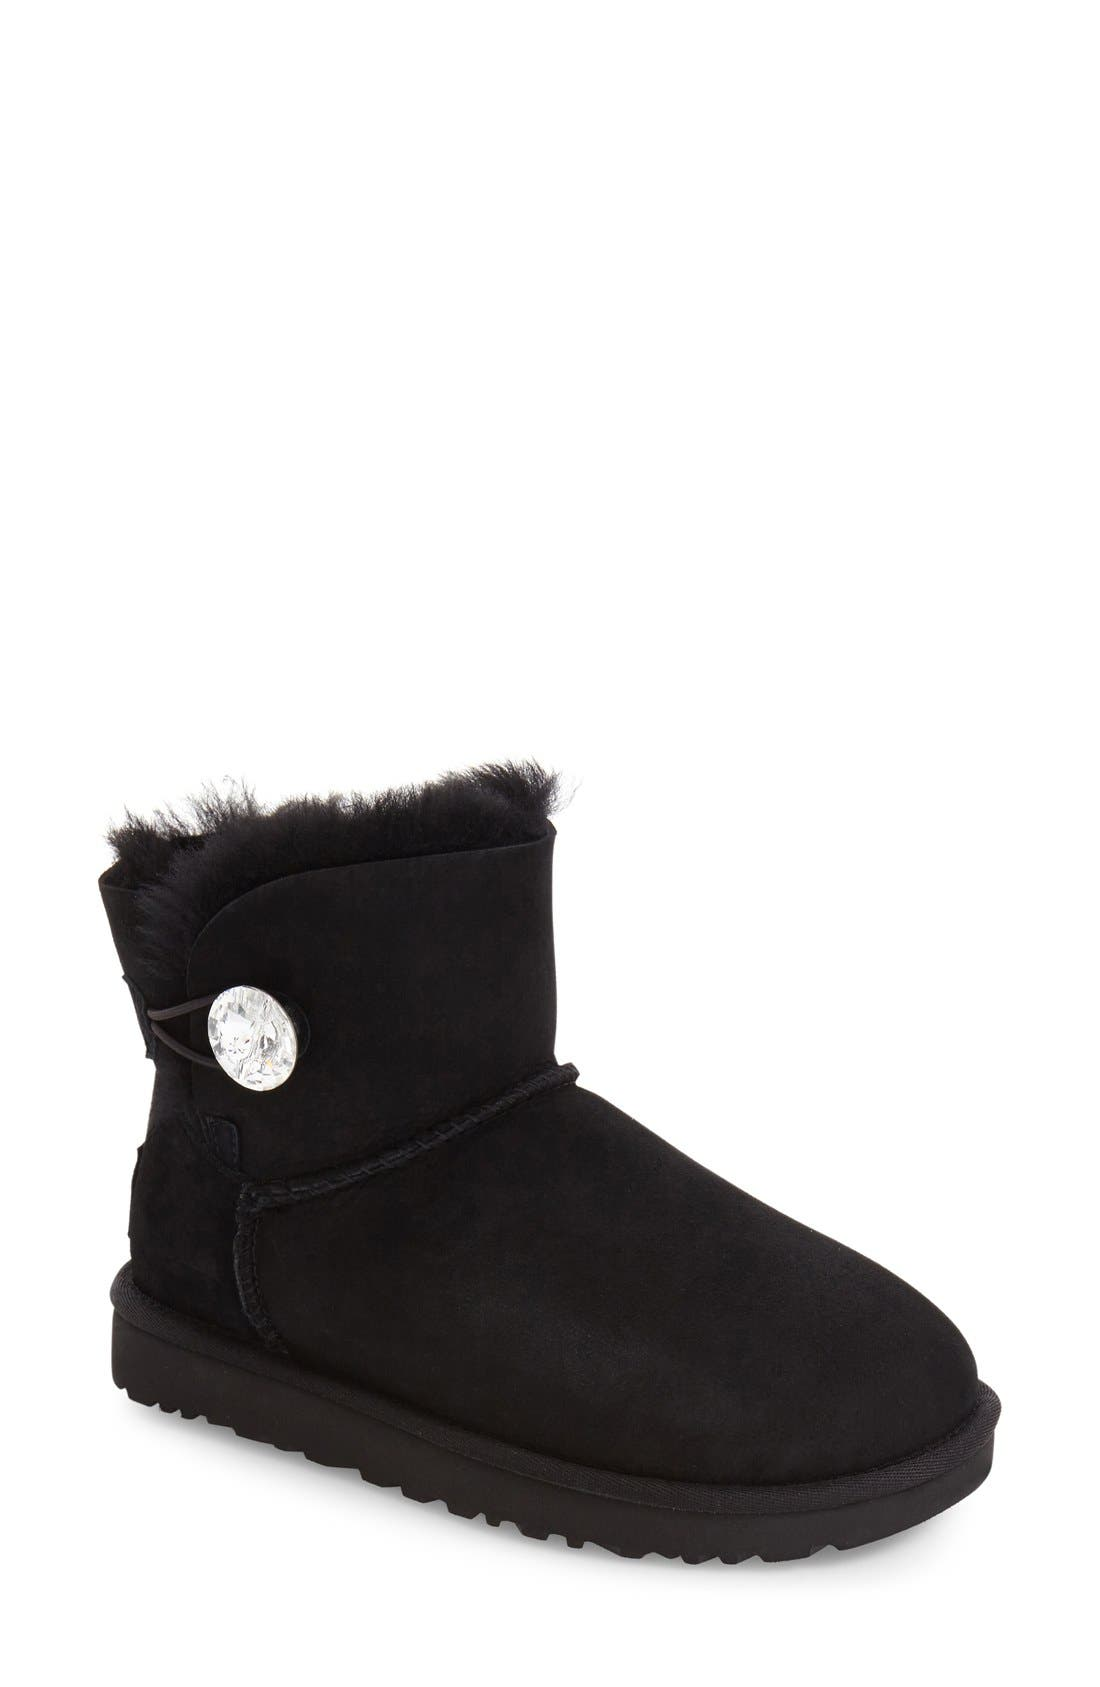 eef8980aa2 ... official ugg mini bailey button bling boot women f93b7 495a1 ...